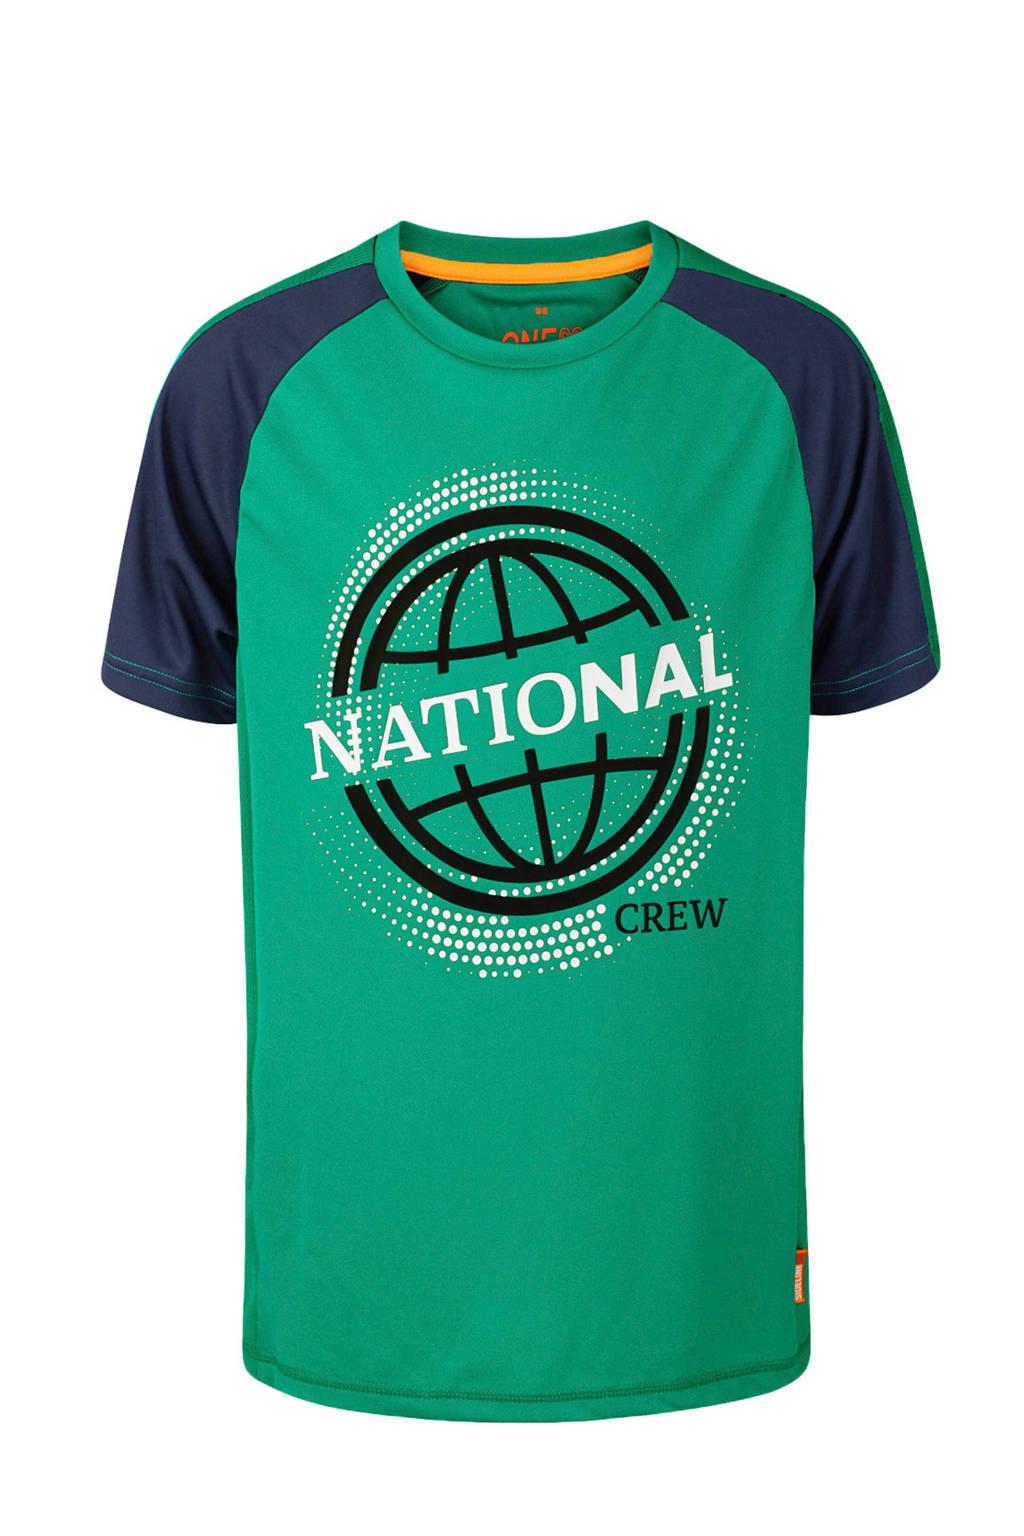 WE Fashion T-shirt met printopdruk zeegroen/donkerblauw, Zeegroen/donkerblauw